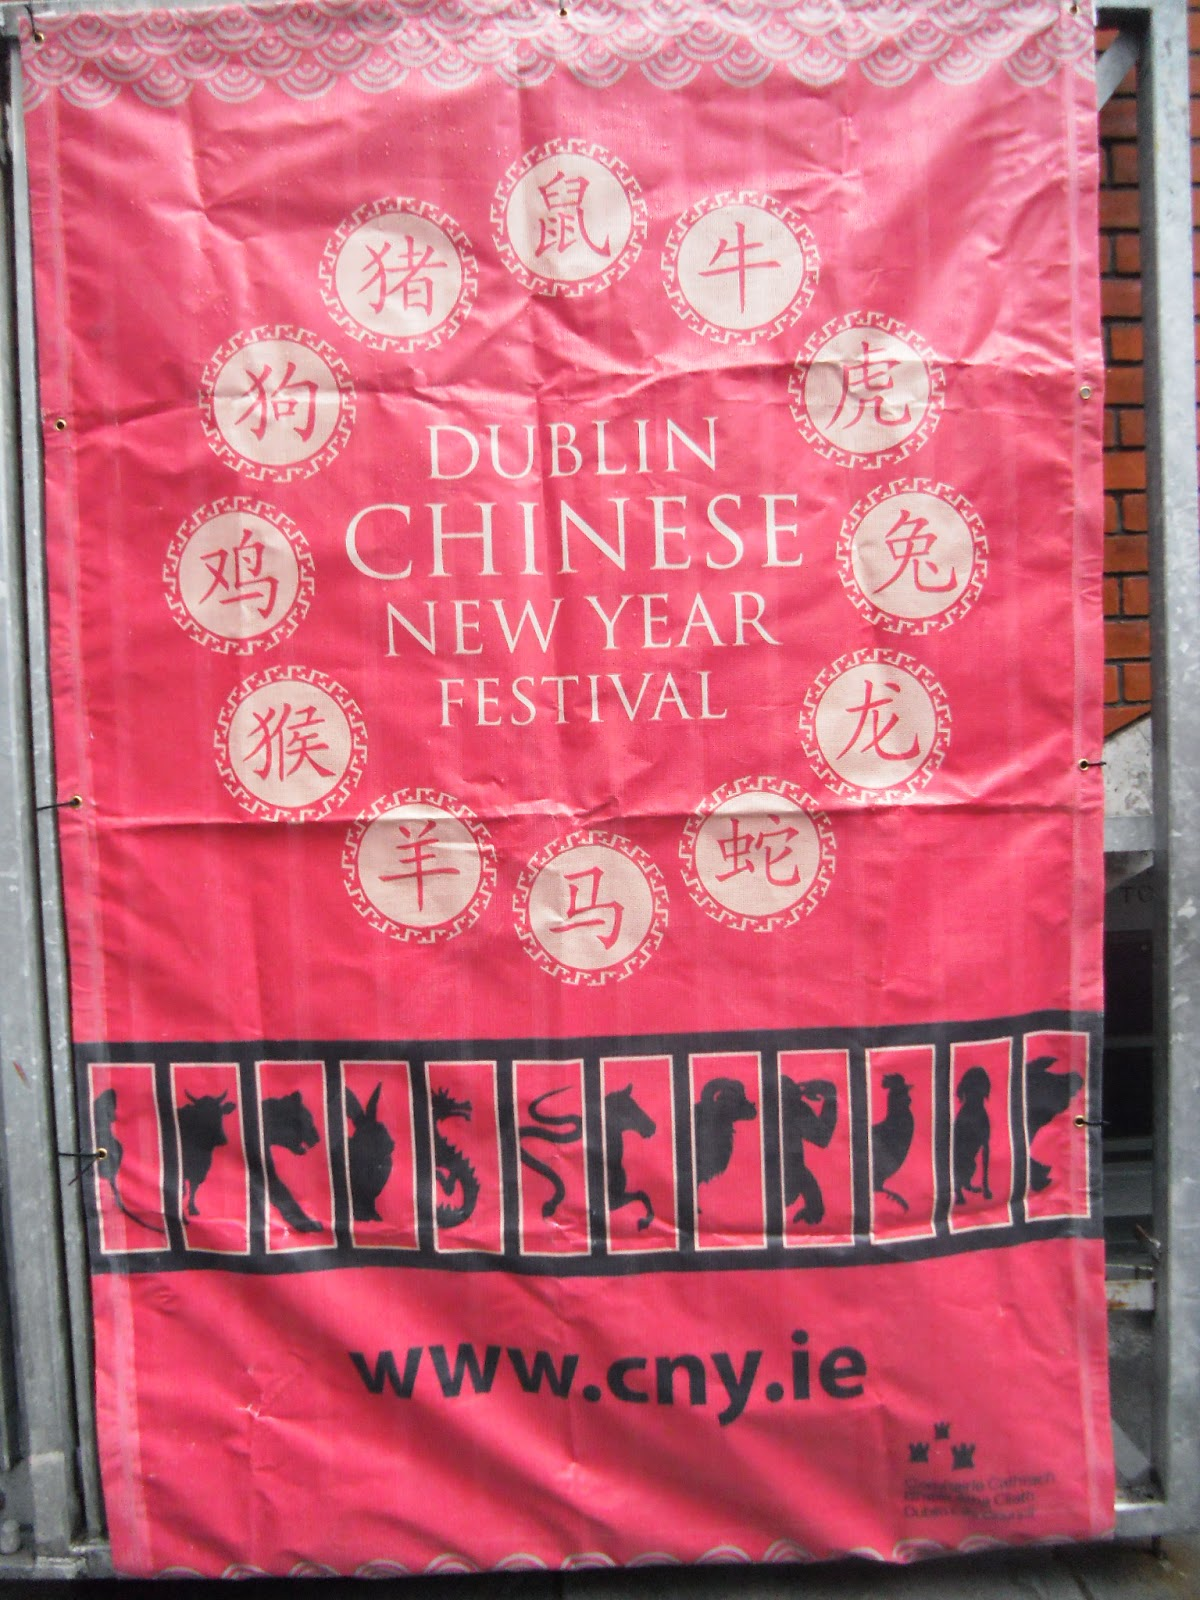 Irene in Irland: Chinese New Year Festival